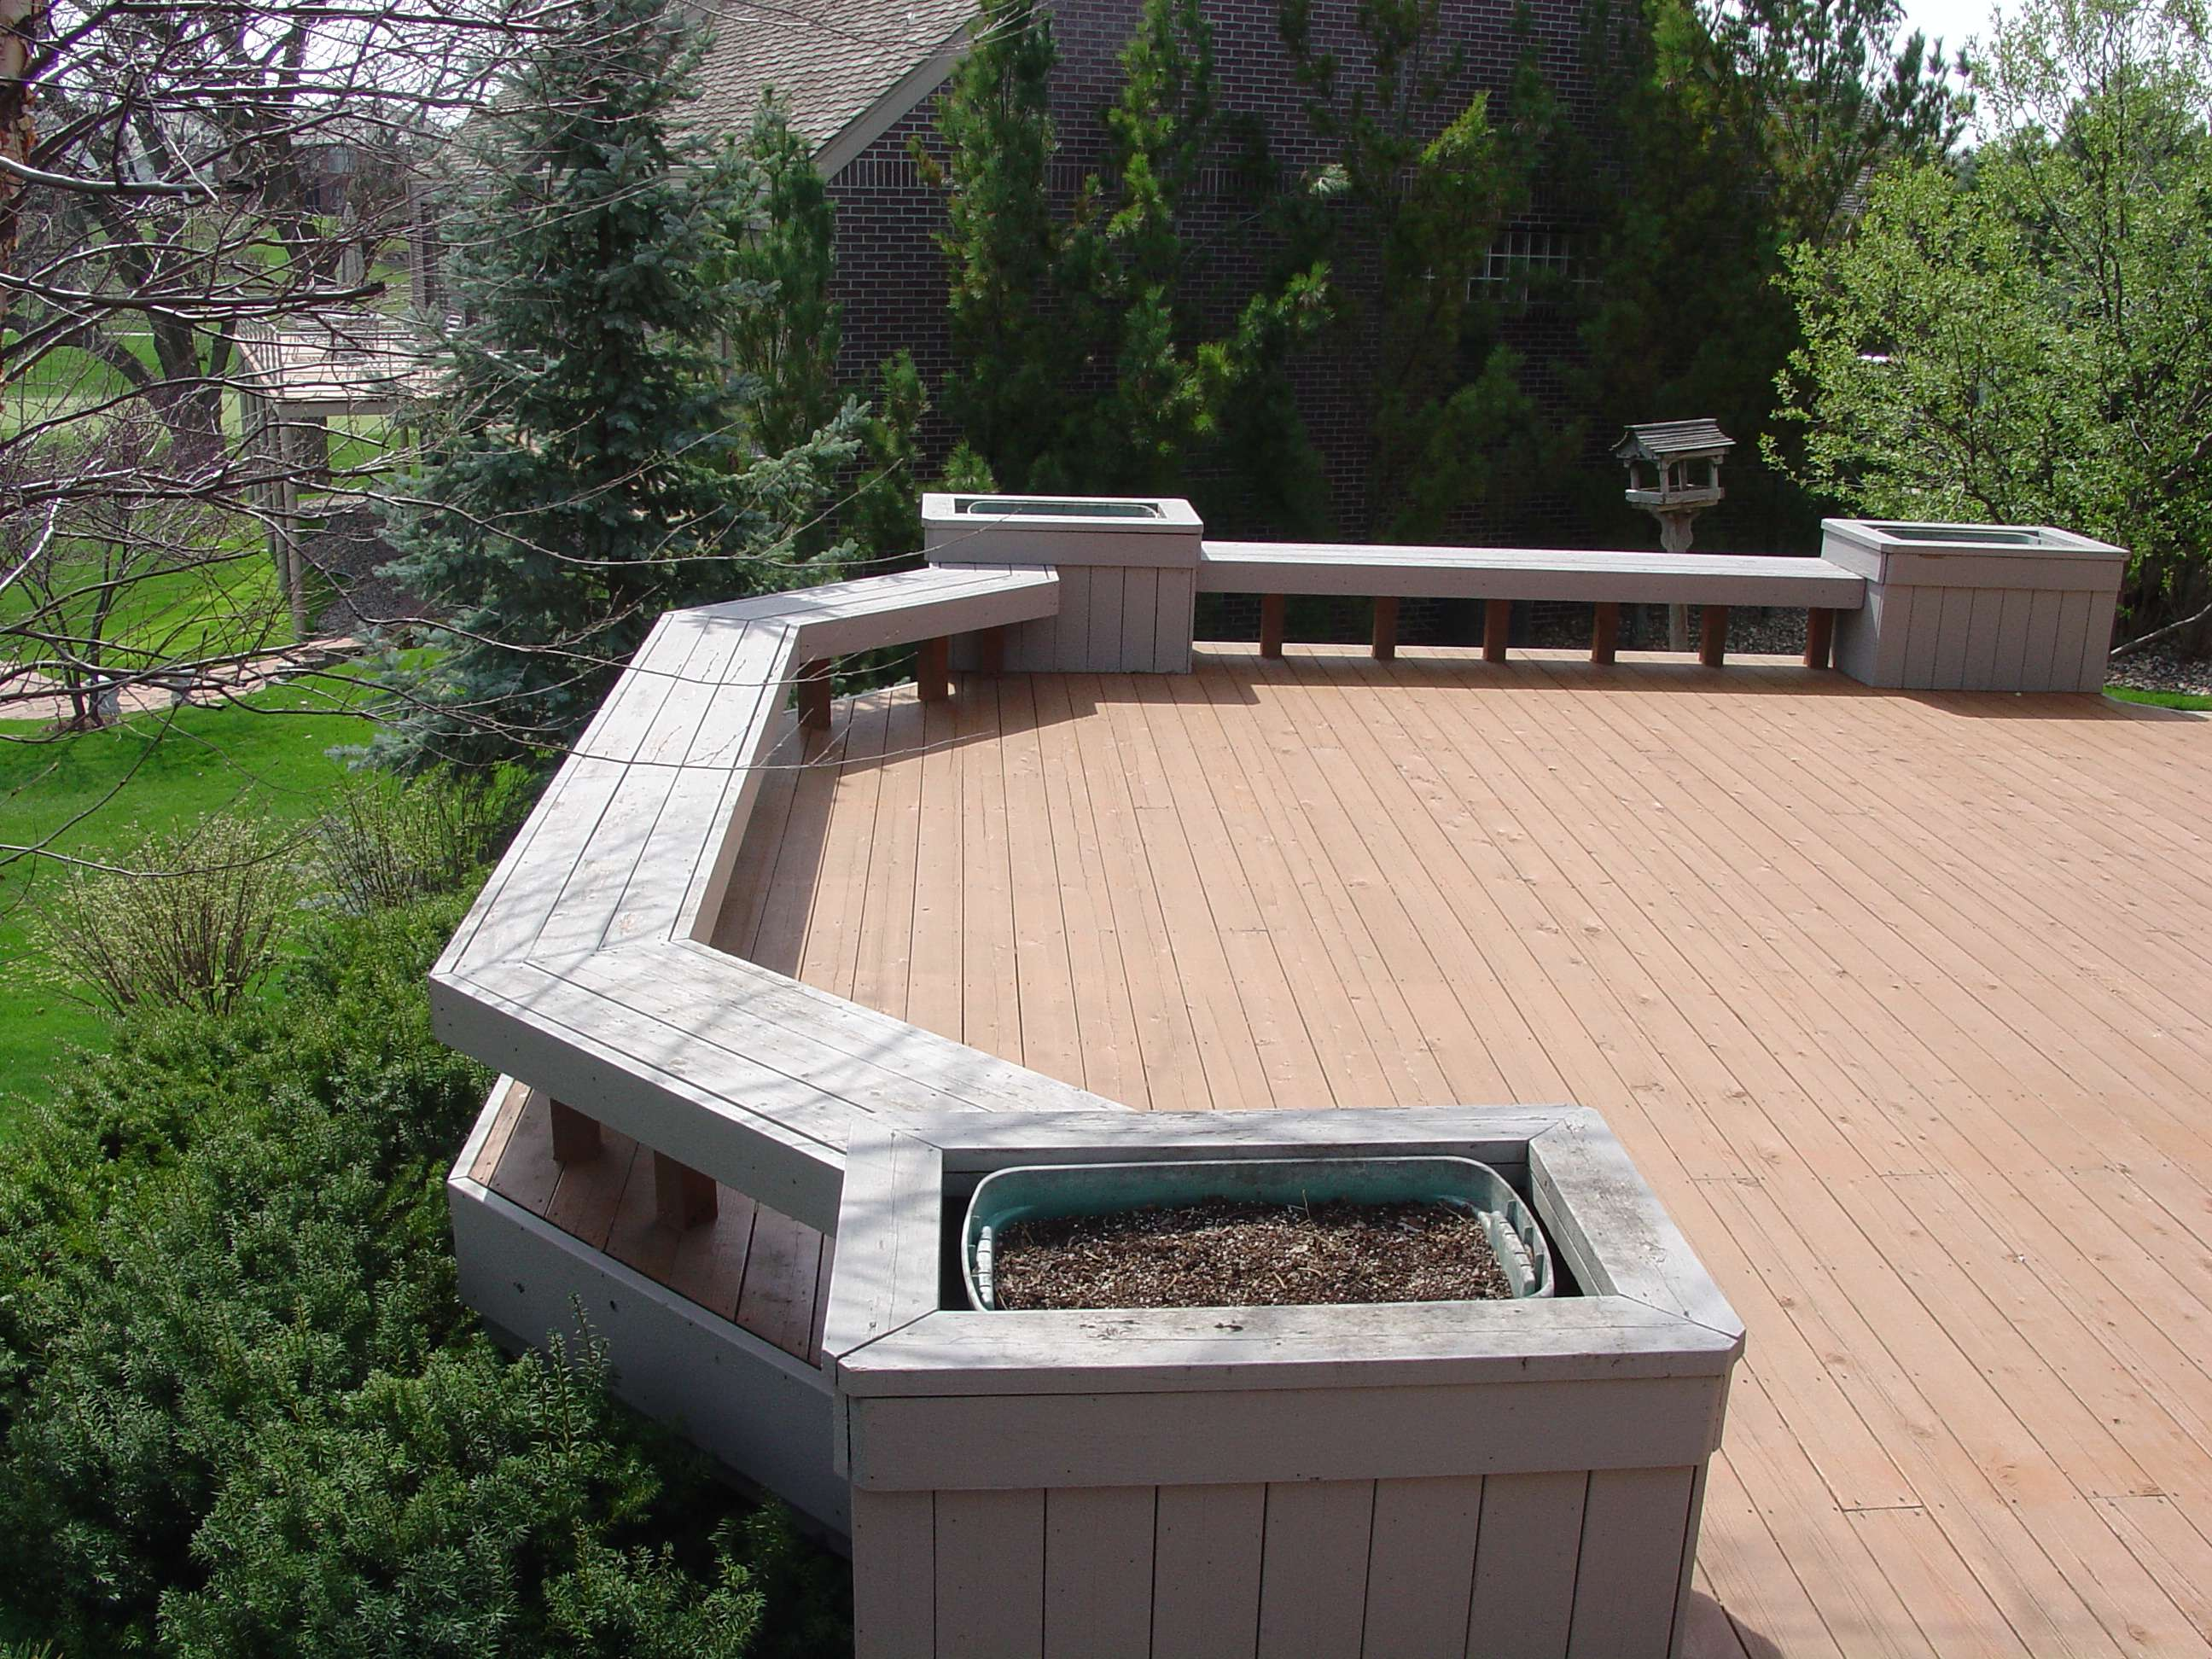 Mike Jansen Custom Cedar Decks Deck Building Services